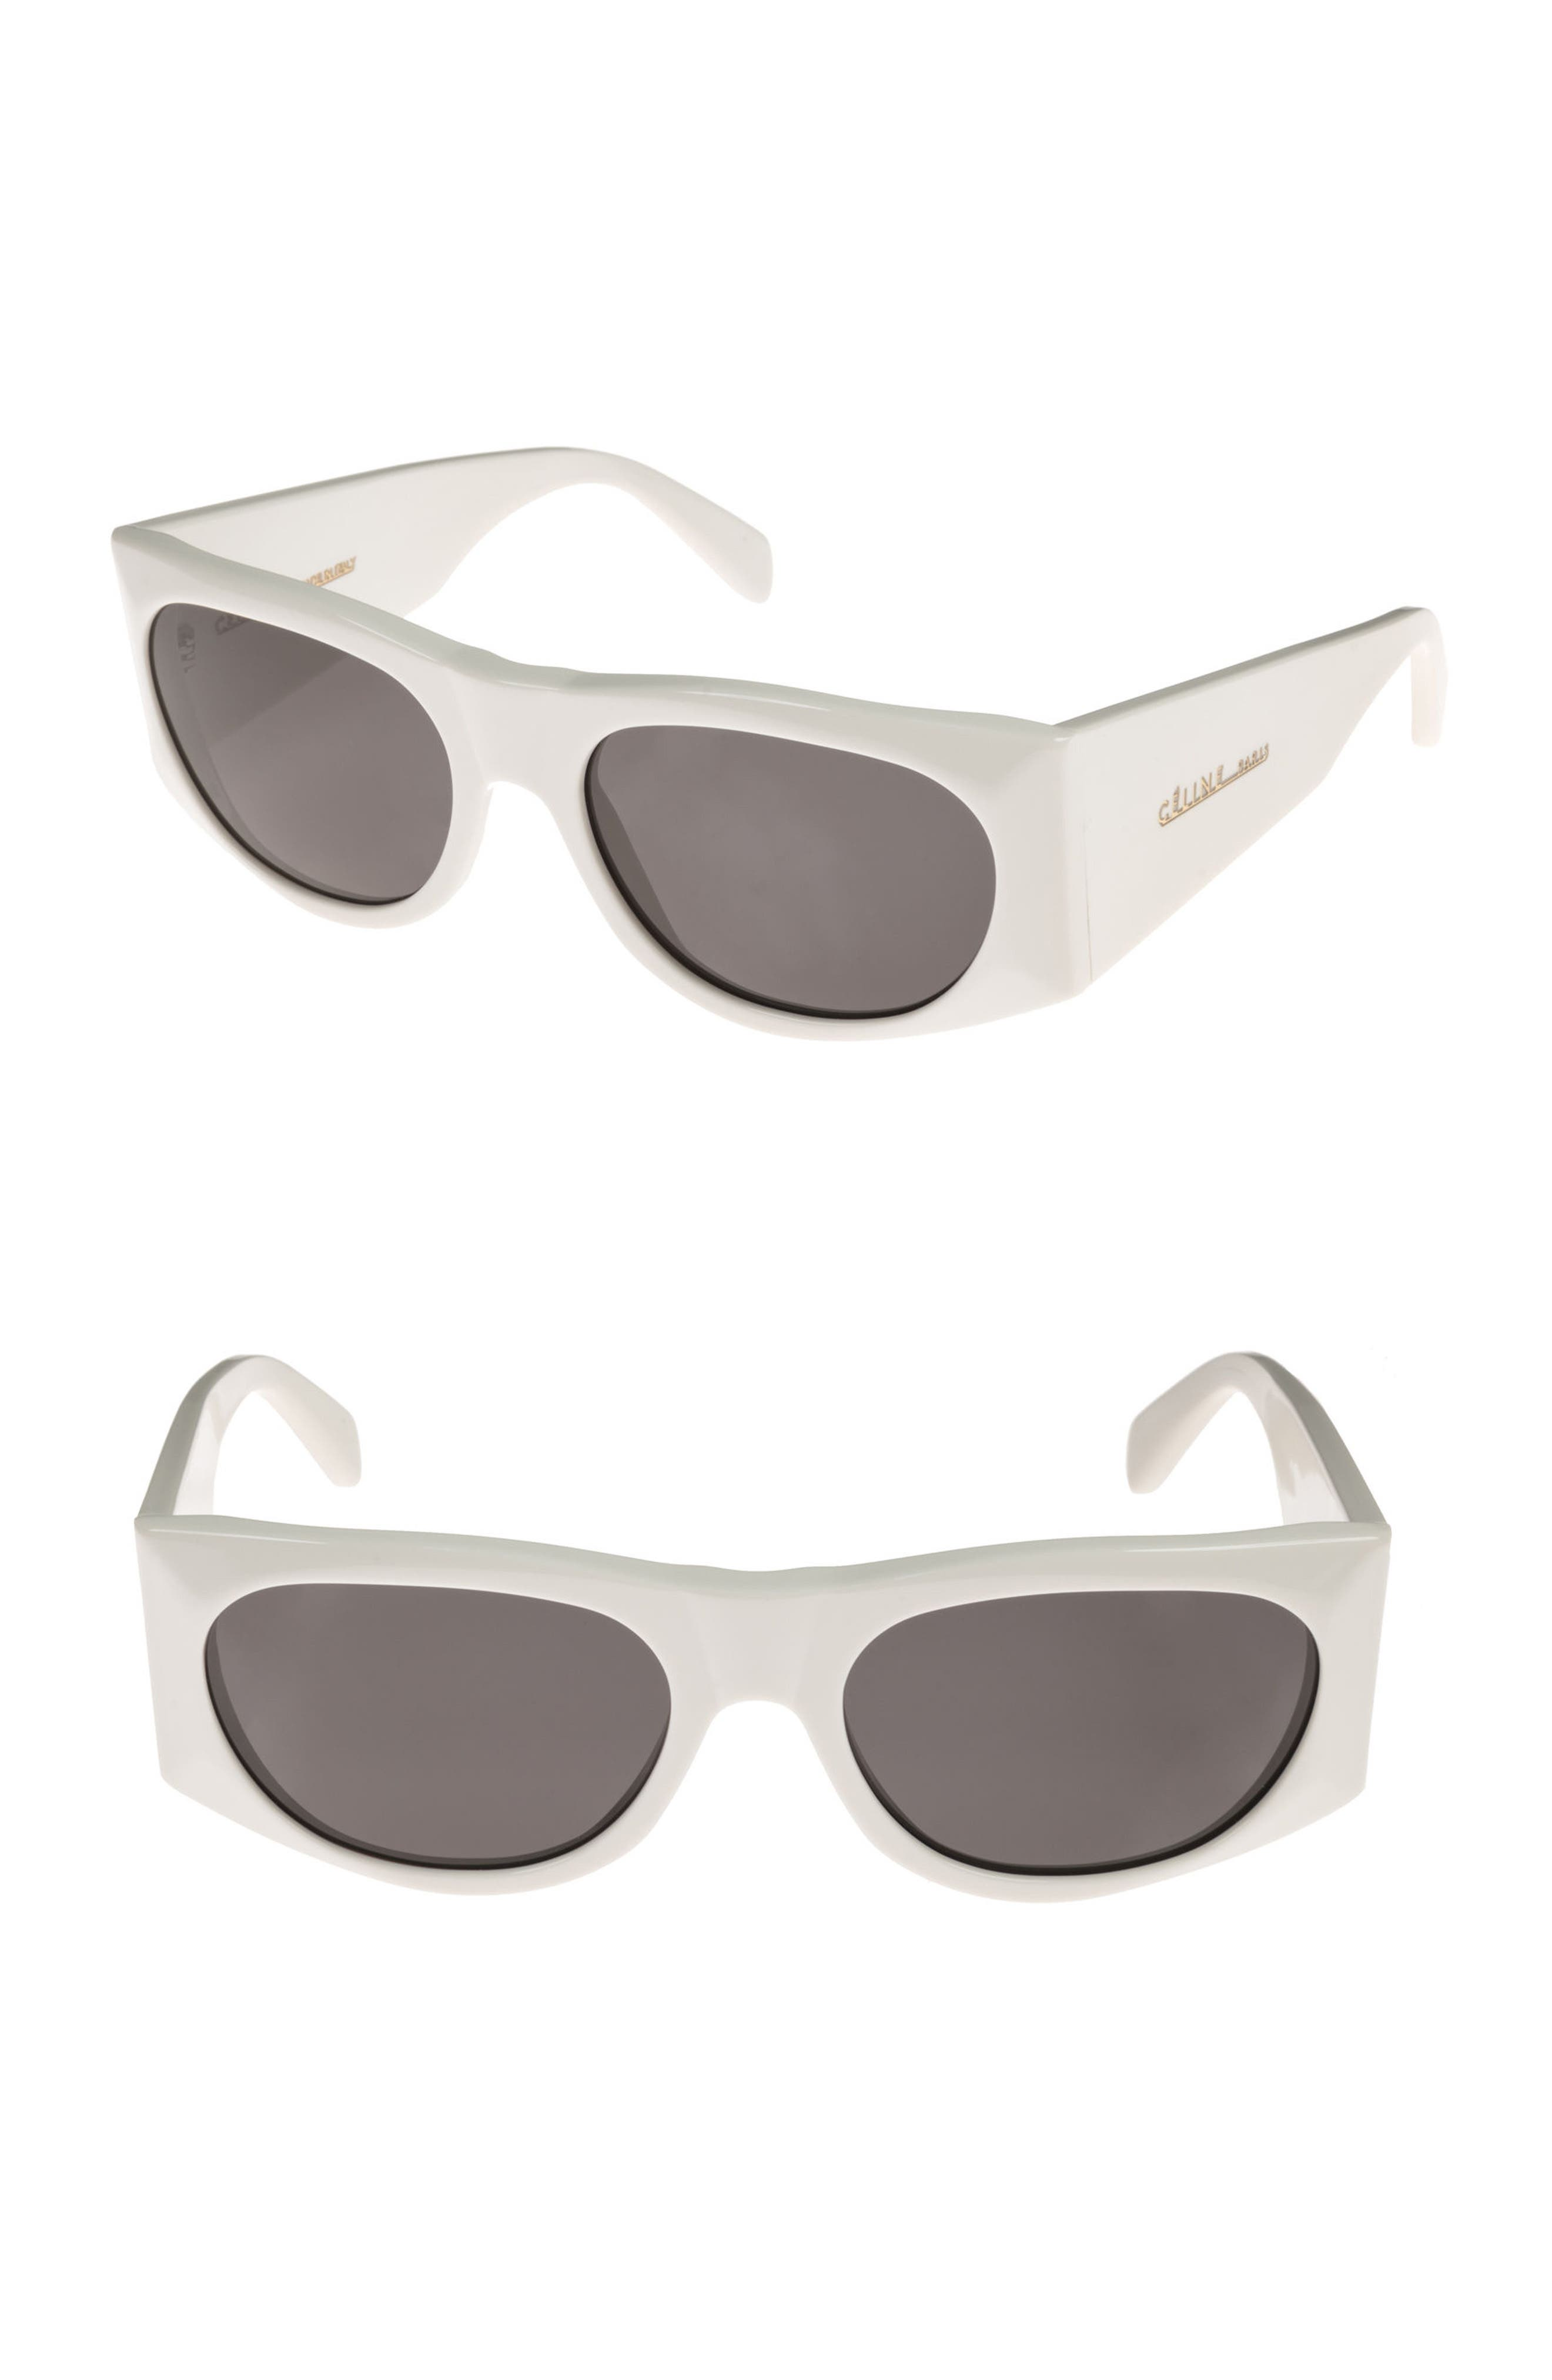 59mm Sunglasses,                         Main,                         color, White Milk/ Smoke